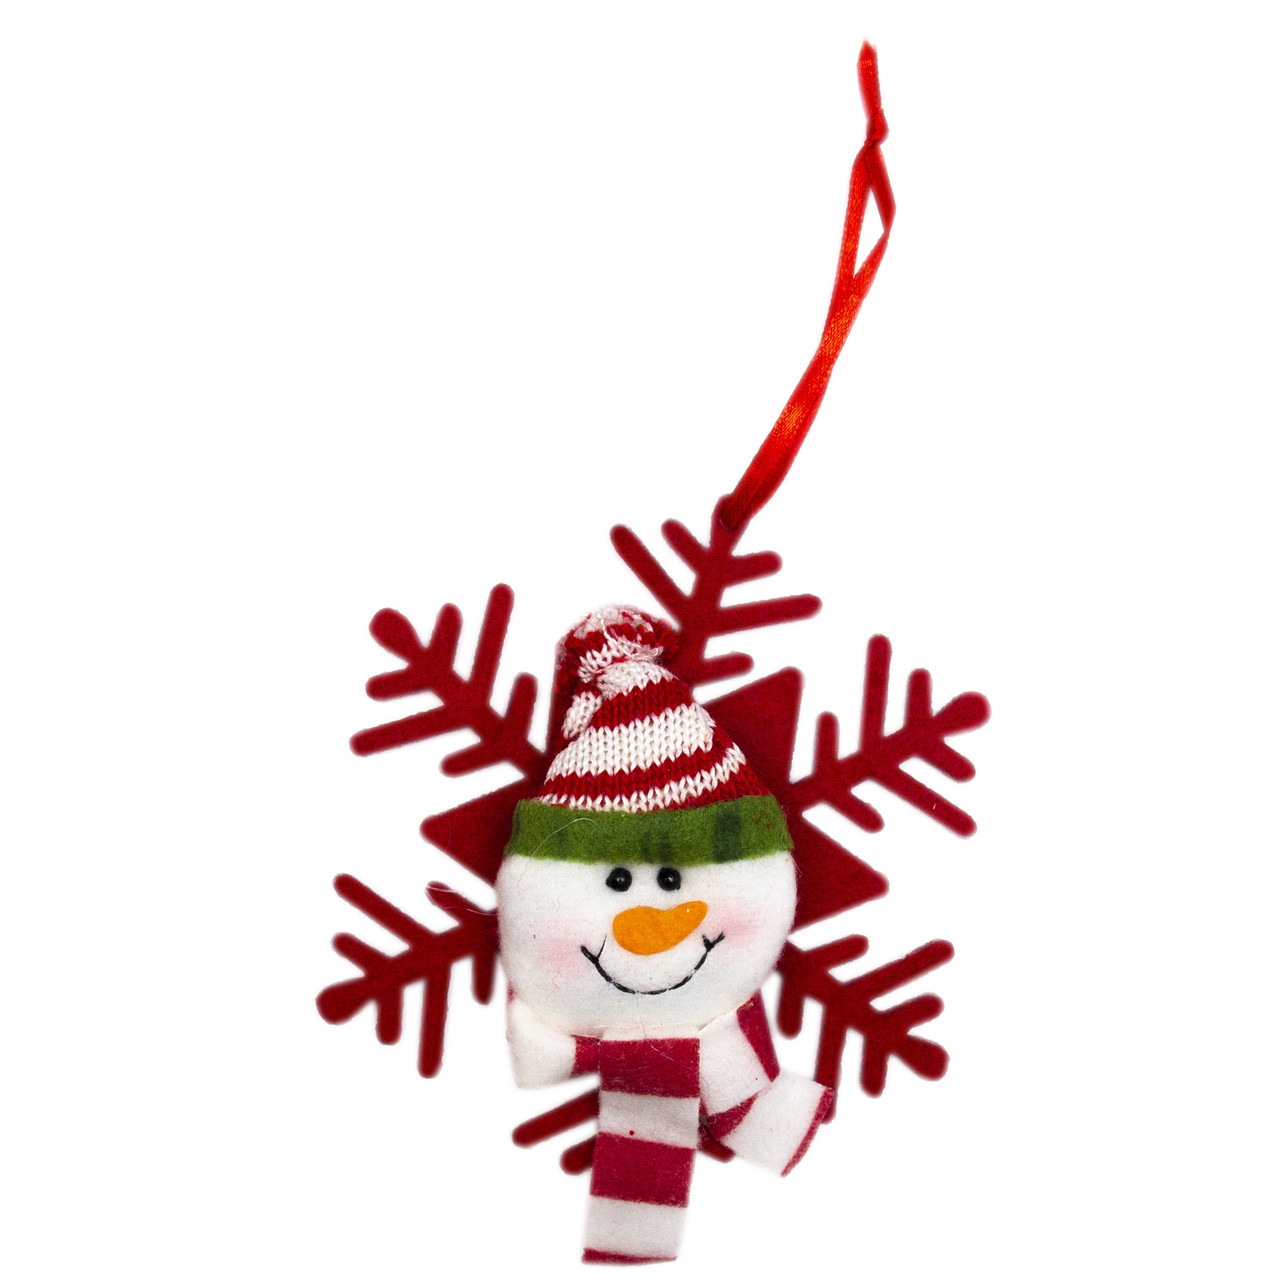 Елочная игрушка из ткани, Снежинки - Снеговик 12 см. (430451-2)